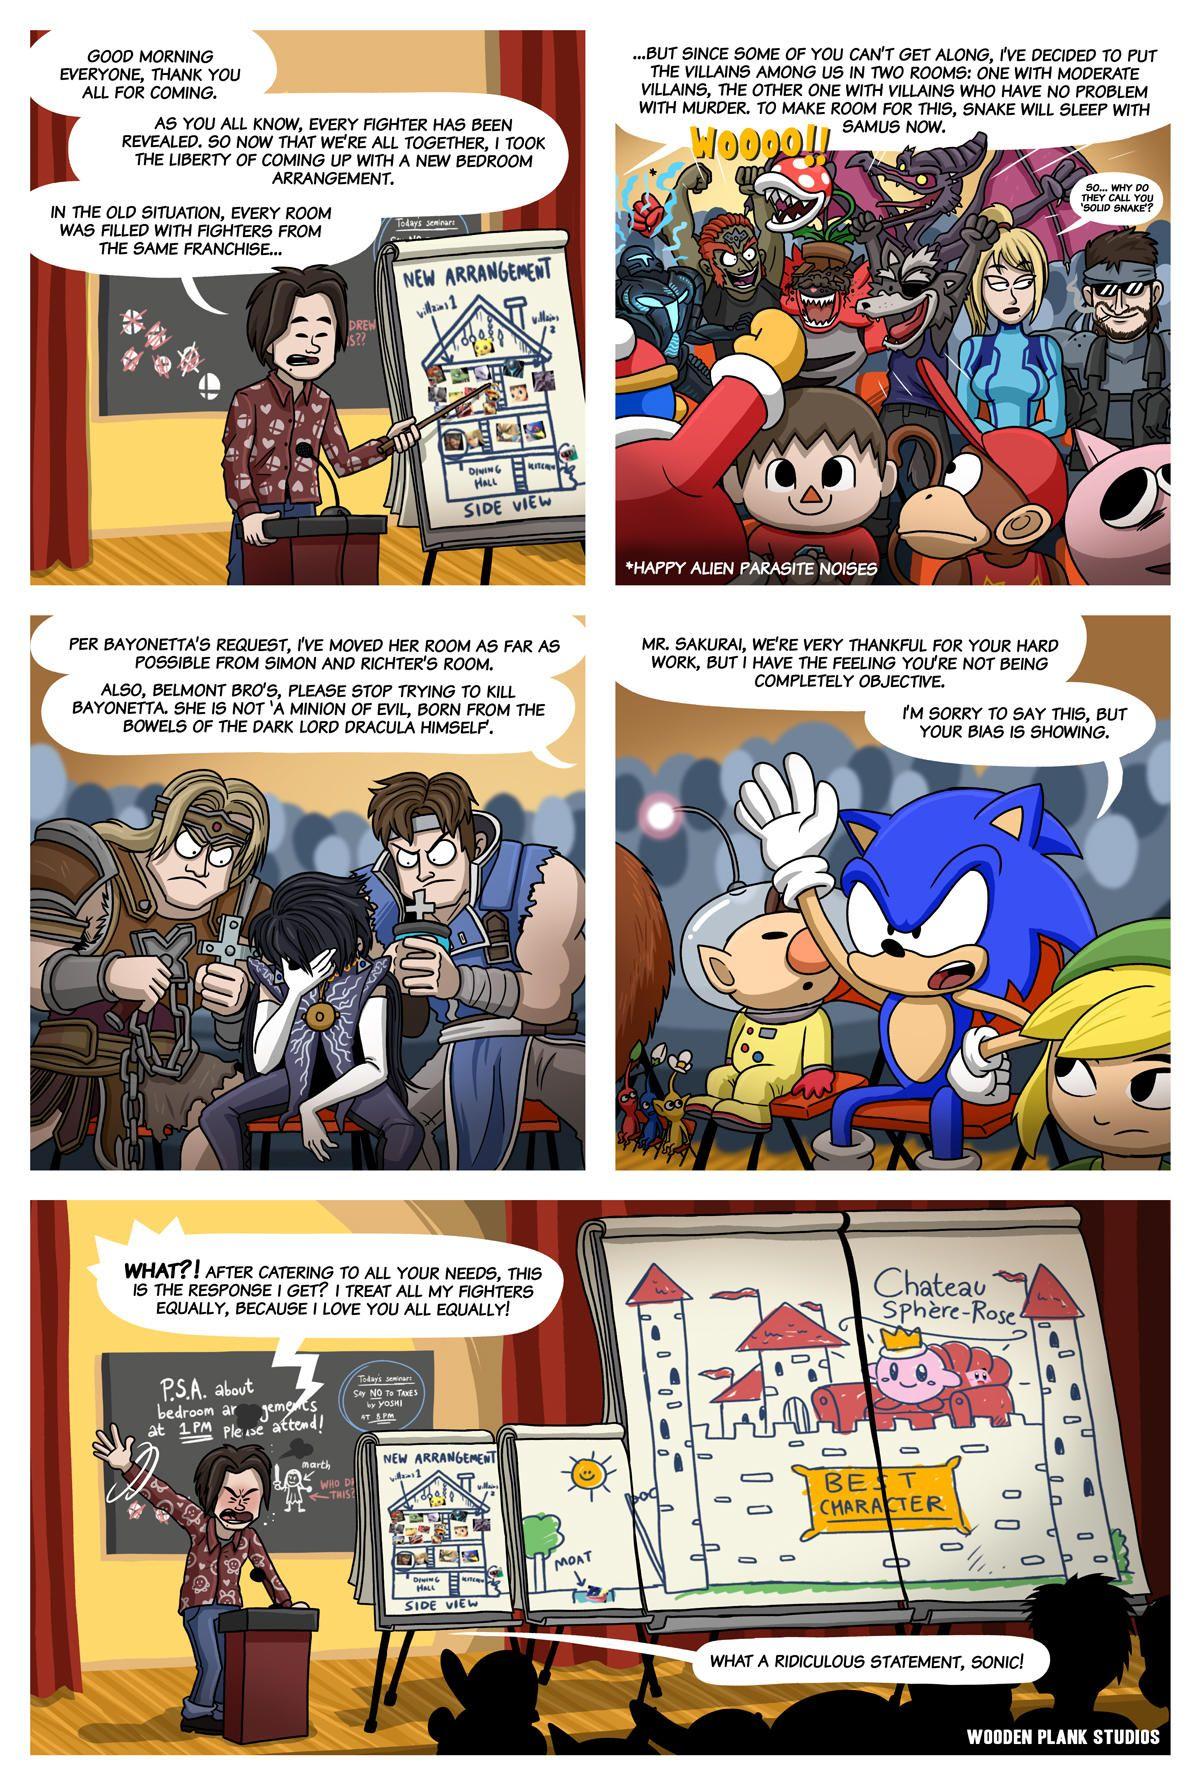 Super Smash Bias With Images Smash Bros Funny Super Smash